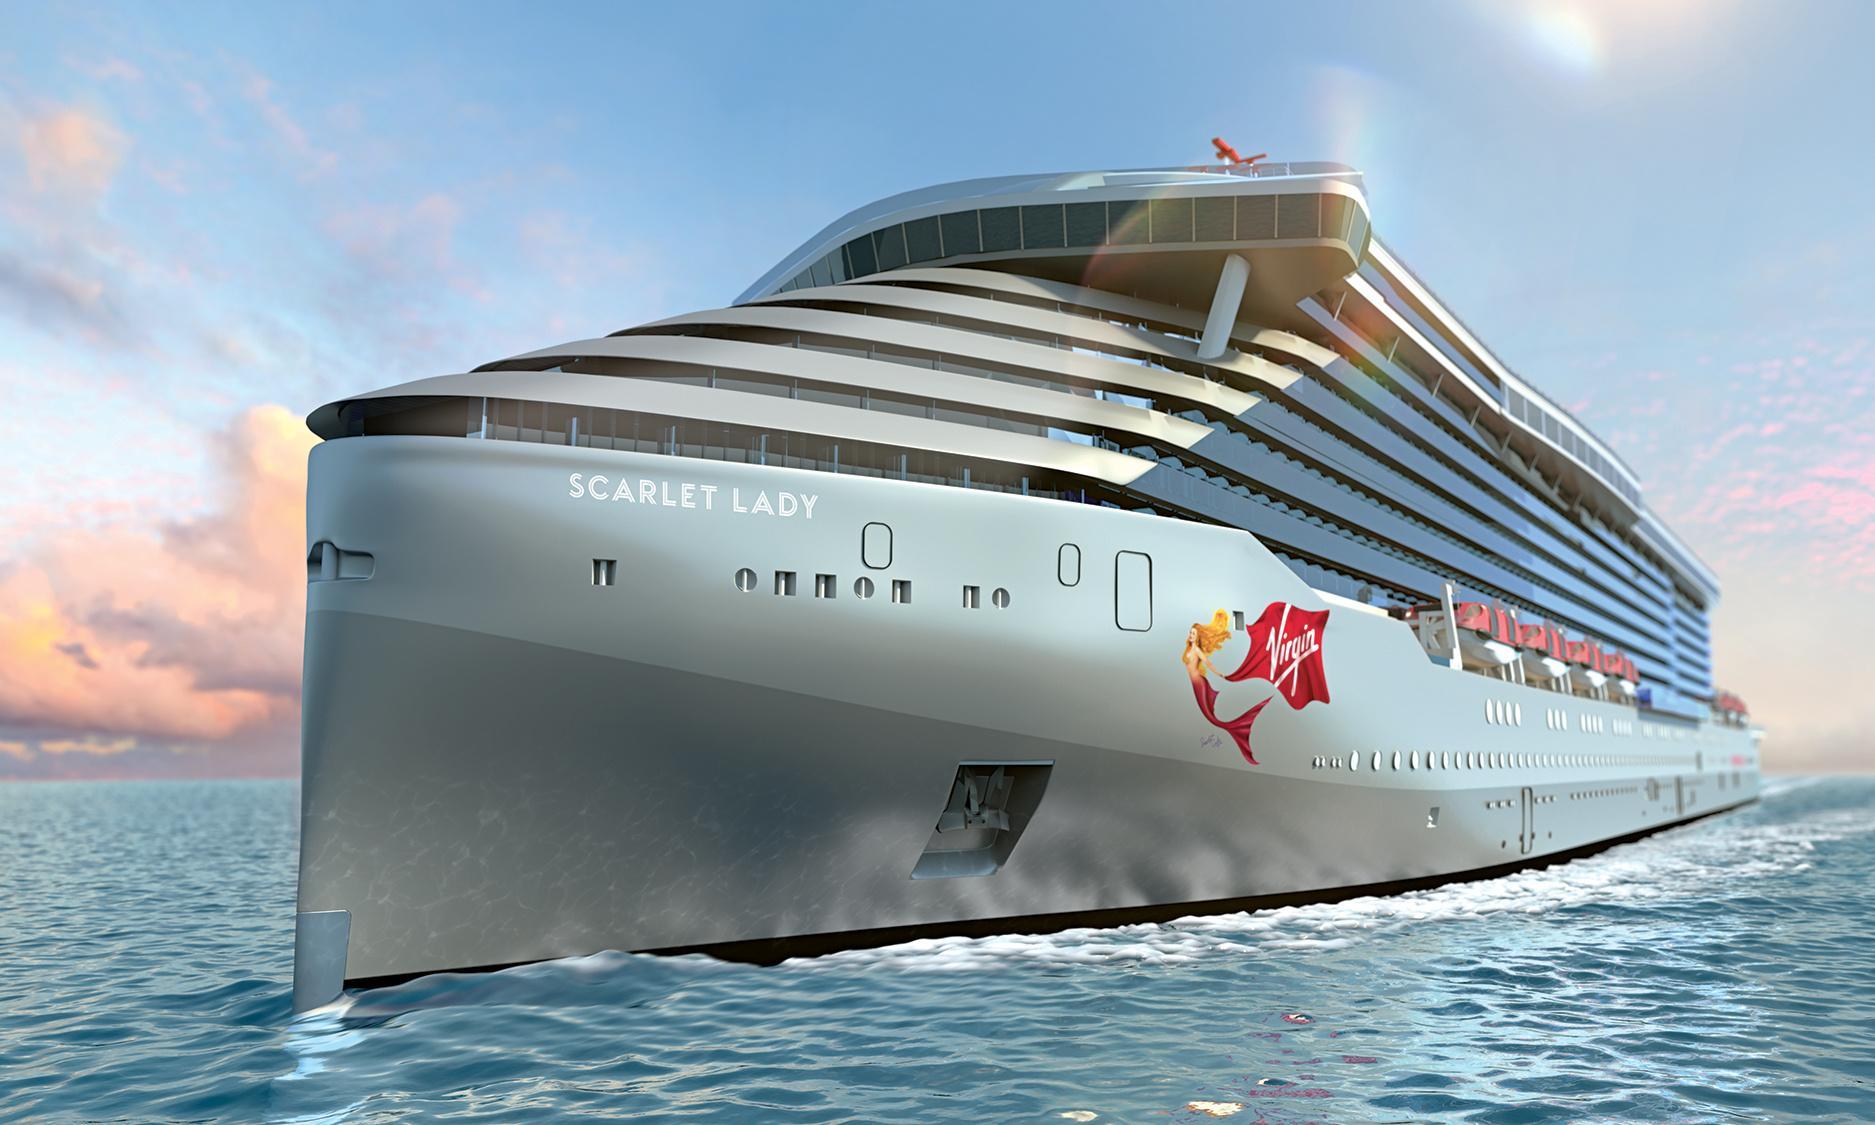 Branson unveils first cruise ship as he shrugs off coronavirus fears